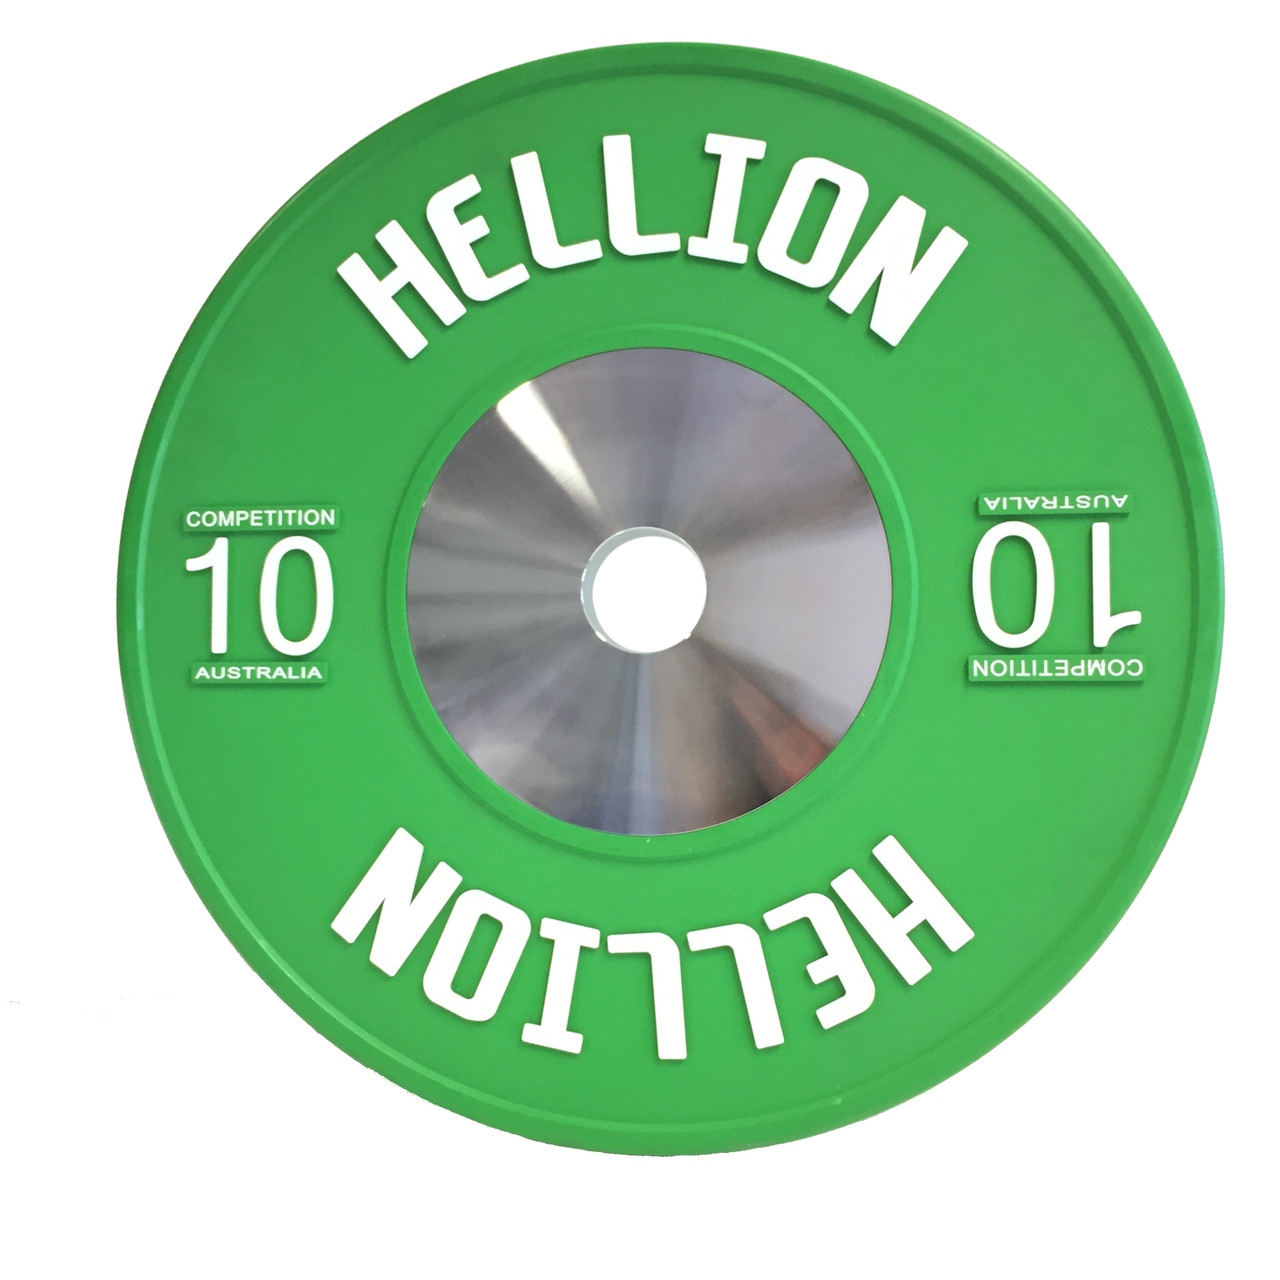 Hellion Elite Competition Bumper Plate V2.0 Raised Logo - 10kg (PAIR)